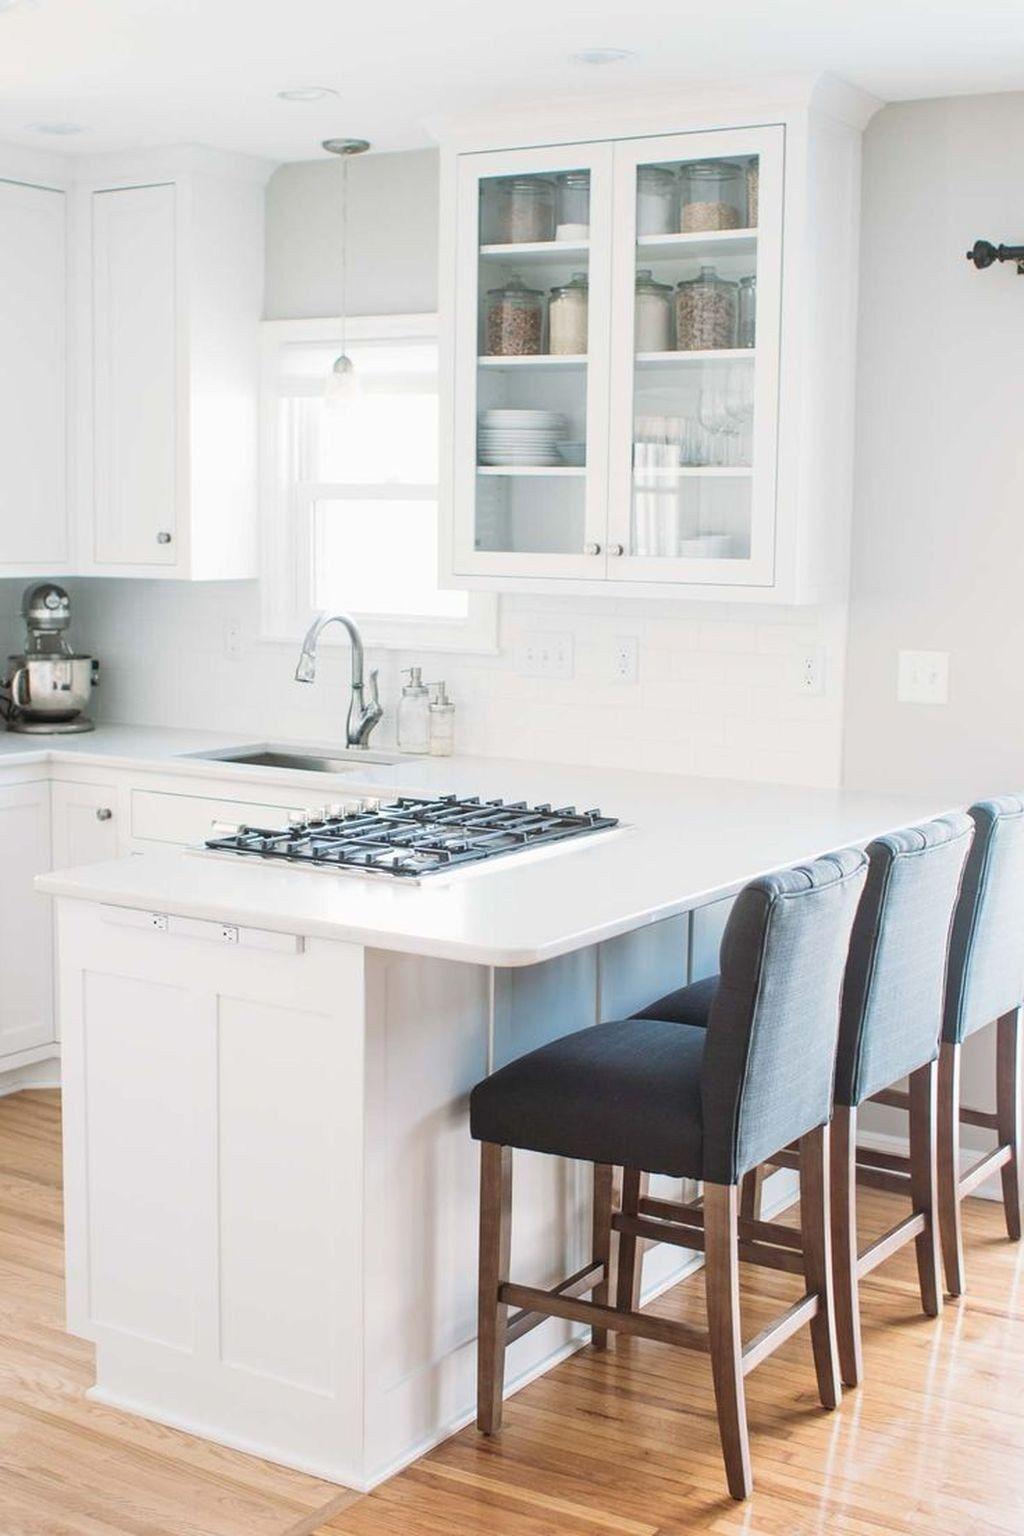 elegant small white kitchen design ideas 49 kitchen remodel small kitchen layout white on kitchen ideas elegant id=69219